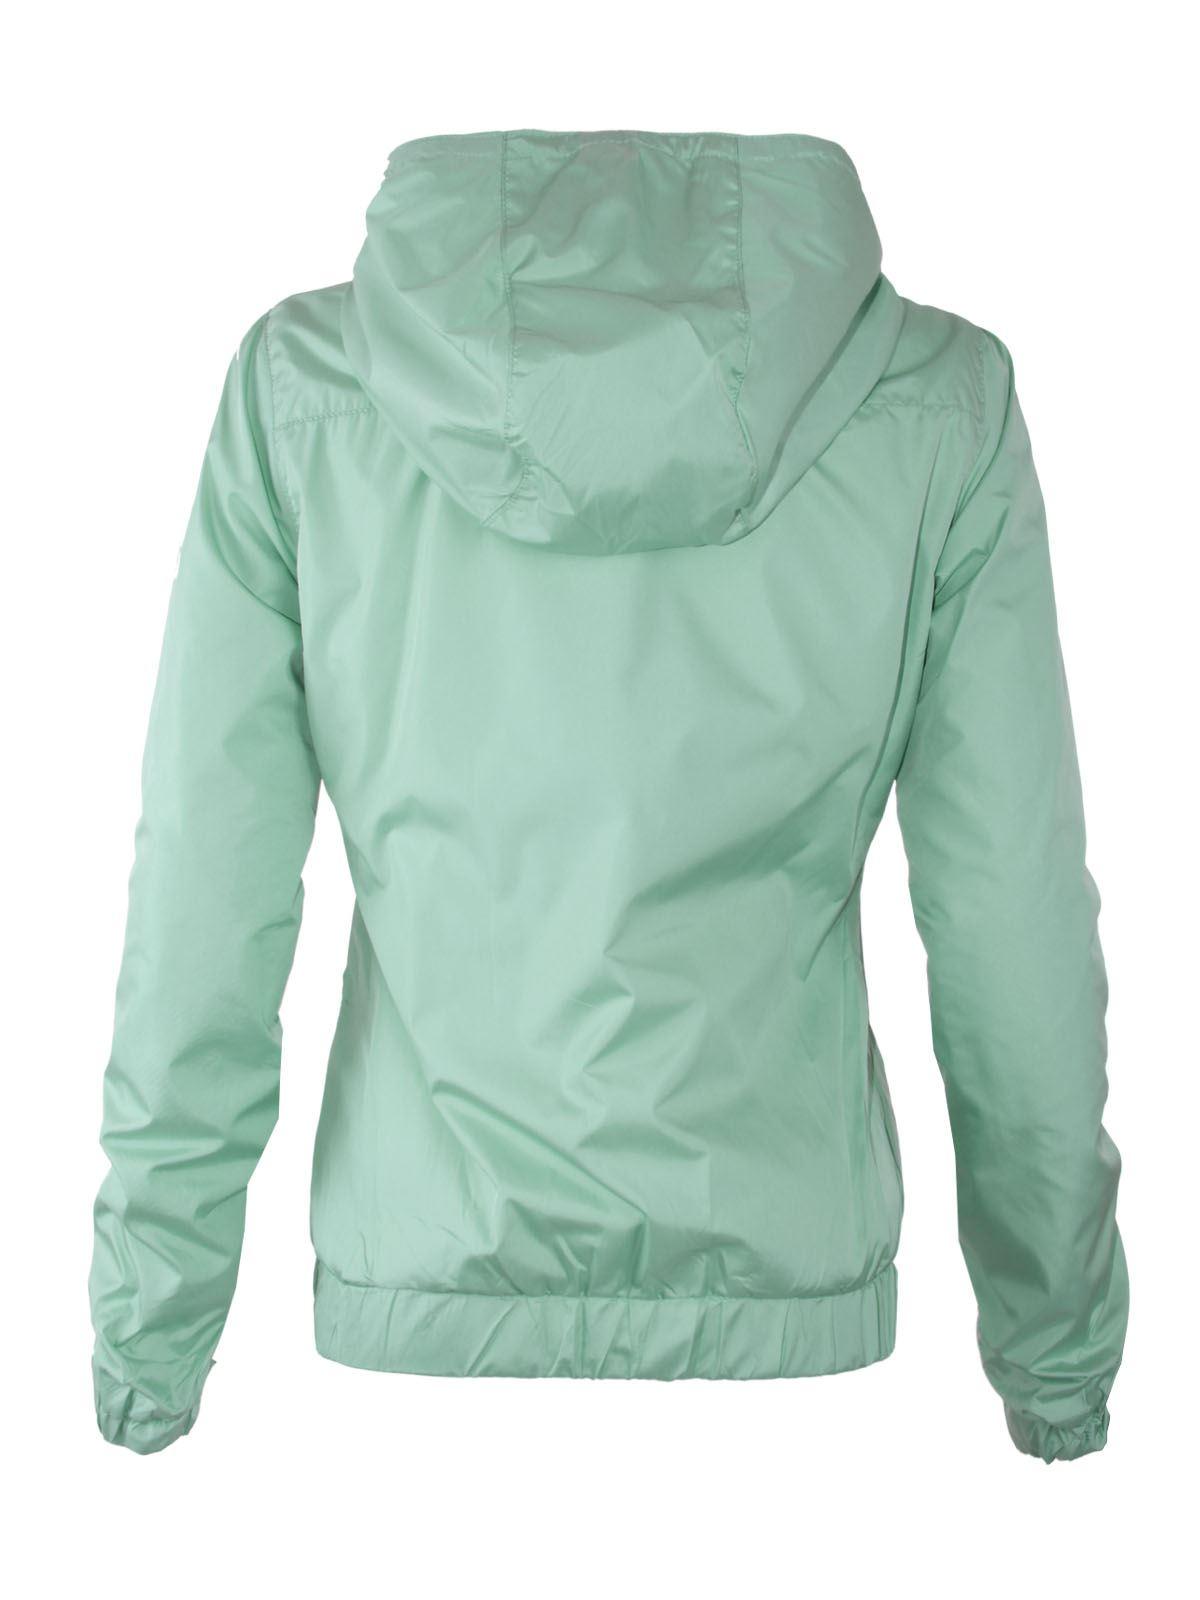 Womens Ladies Running Parka Training Sport Showerproof Coat Hooded Jacket 8-16